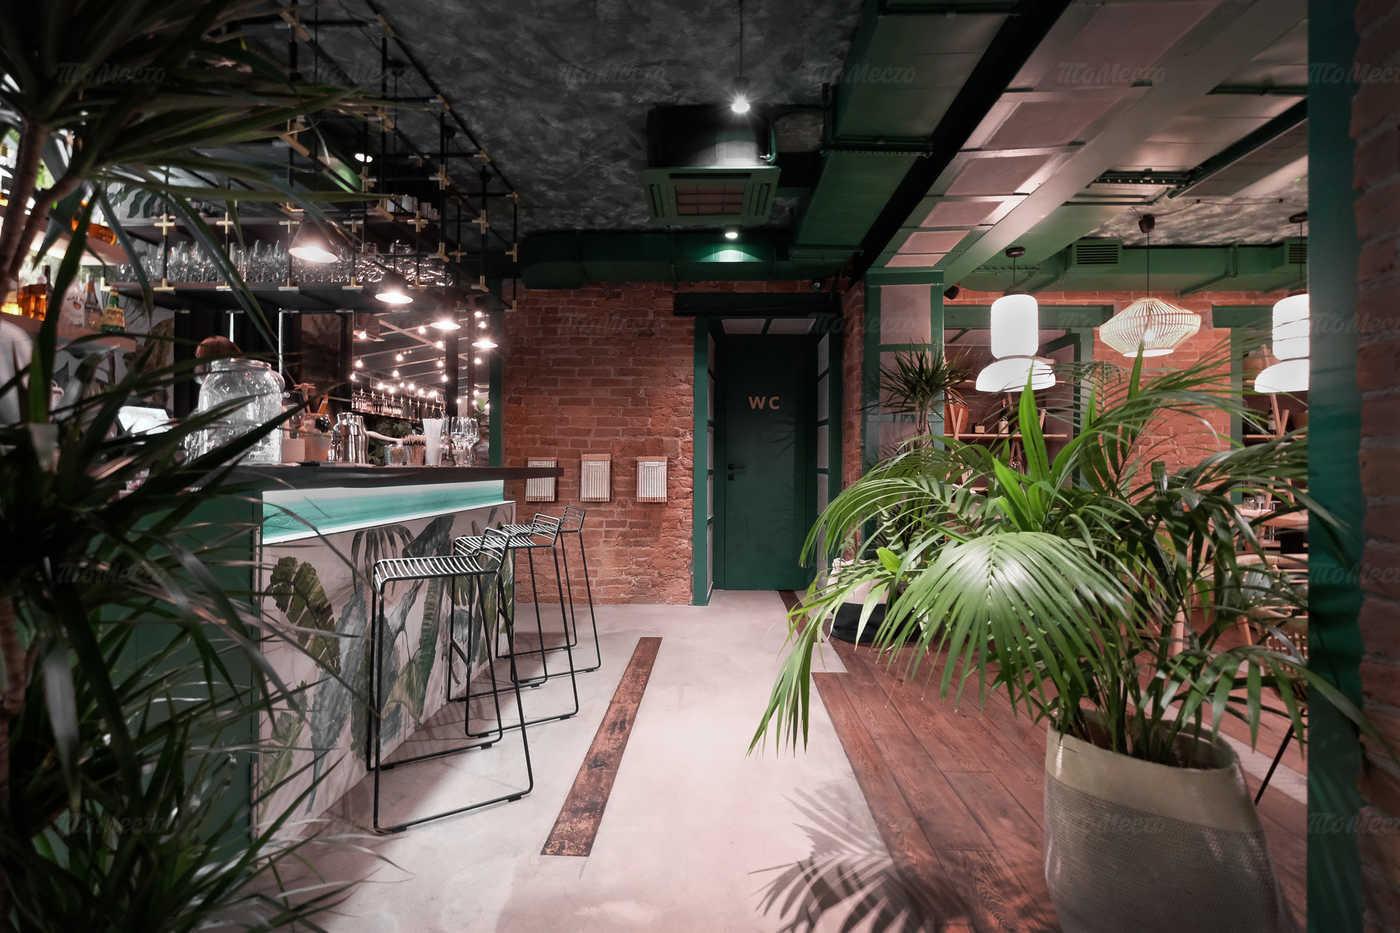 Кафе Jungle (Джунгли) на набережной канала Грибоедова фото 4